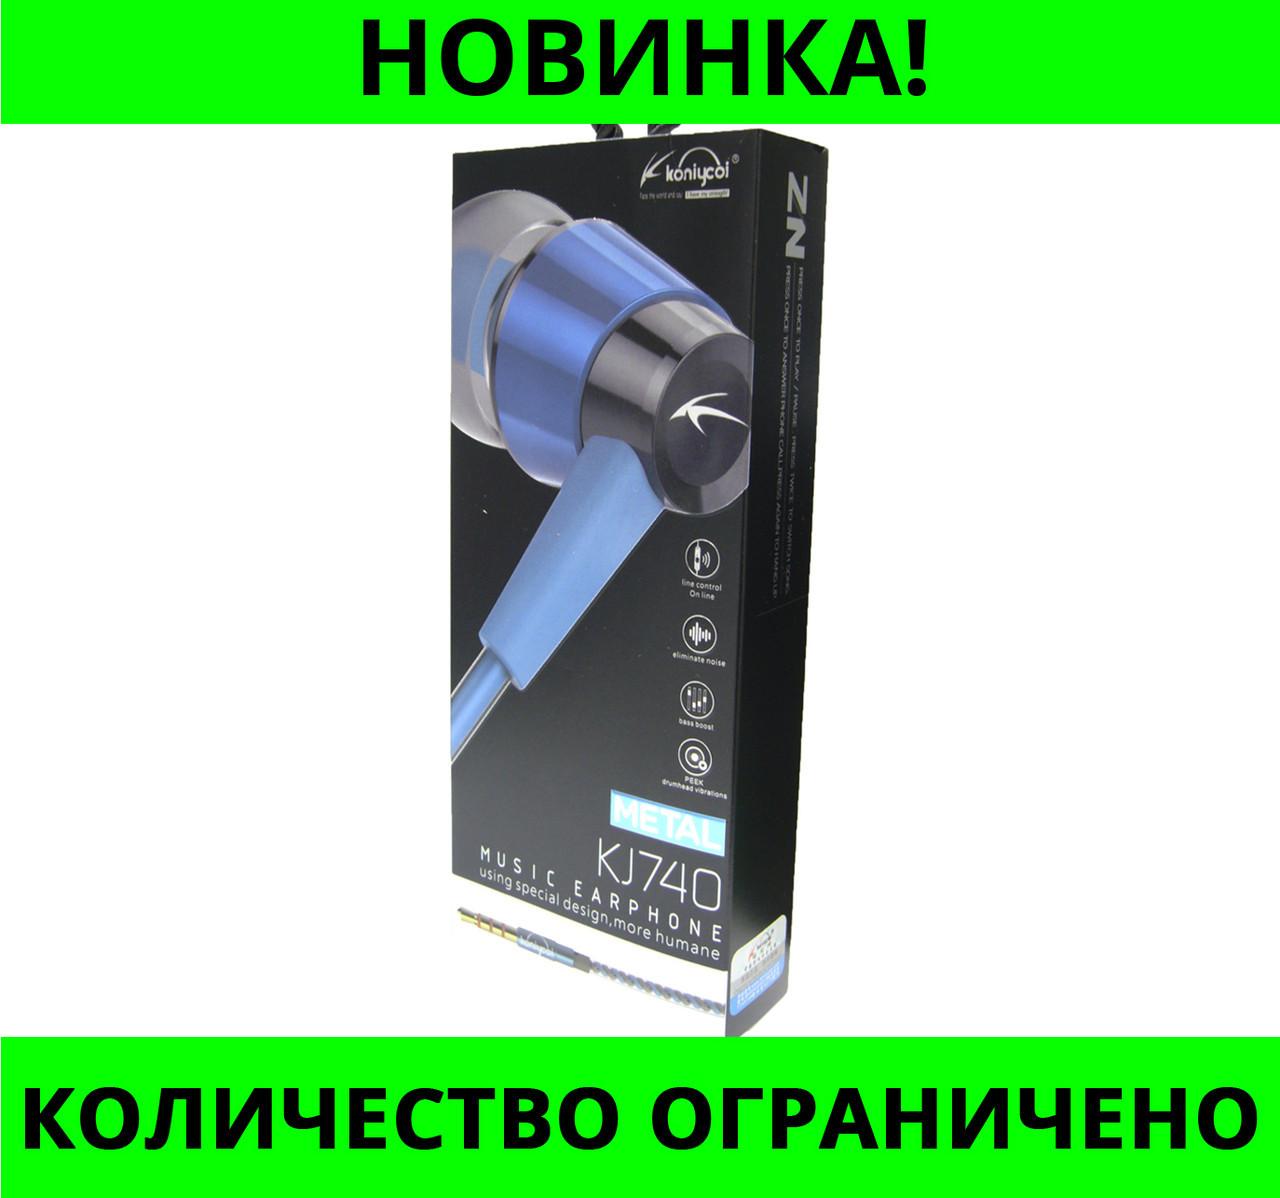 Наушники вакуумные Koniycoi KJ740!Розница и Опт